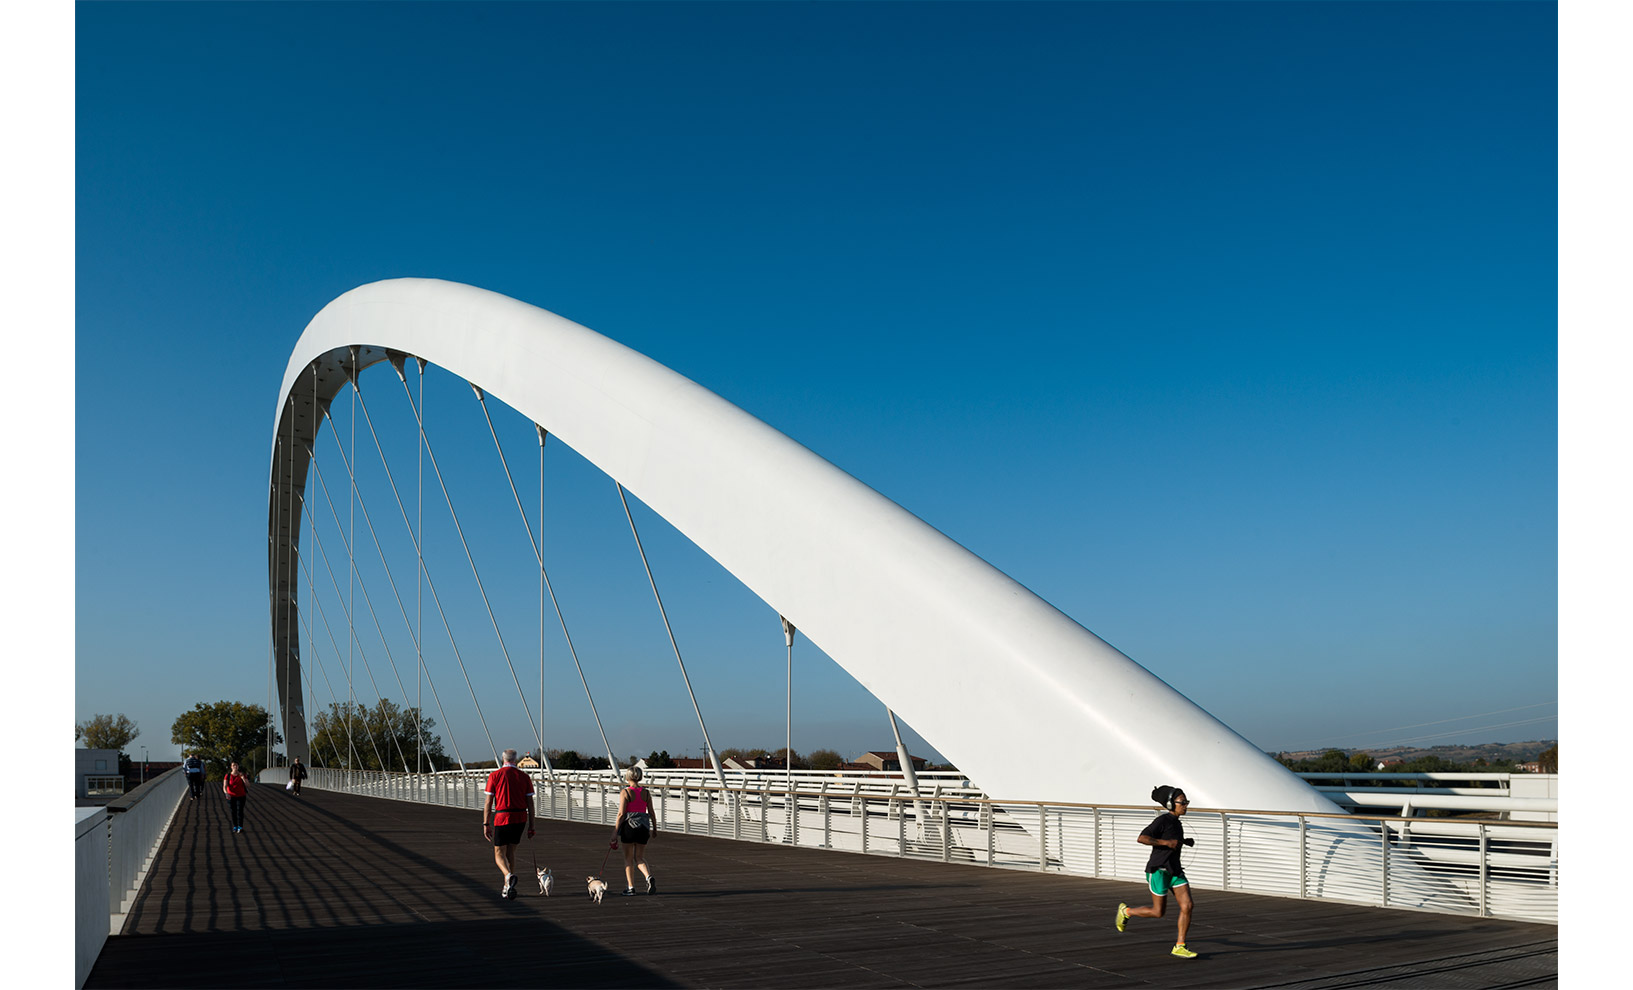 ©marco-tacchini-fotografo-ponte-cittadella-richar-meier-and-partners_15